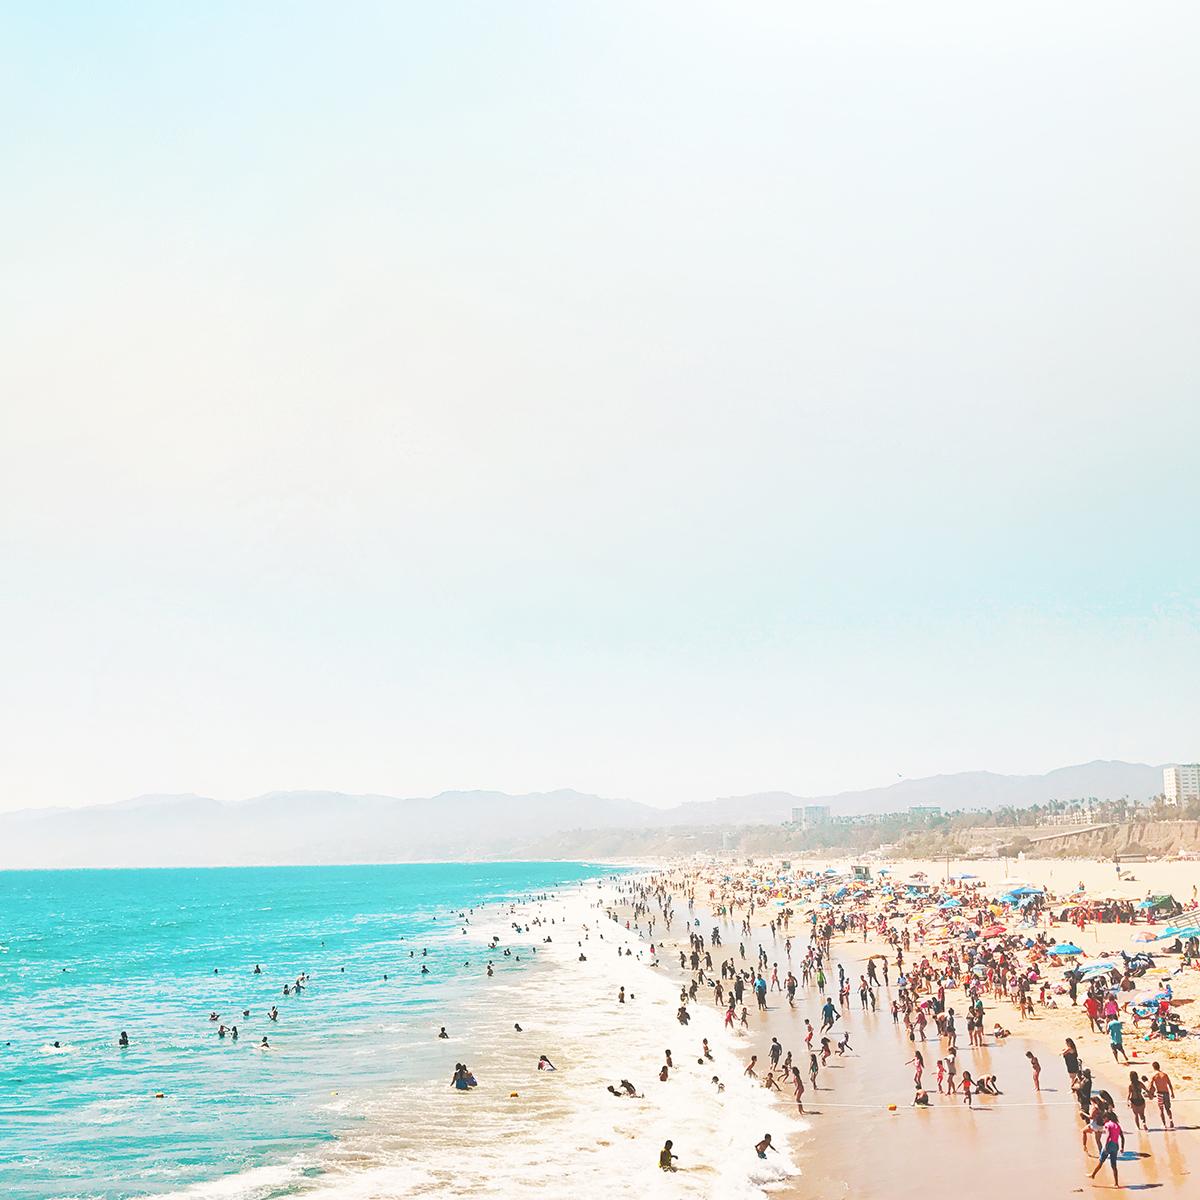 View of the beach from the Santa Monica Pier in Santa Monica, California.